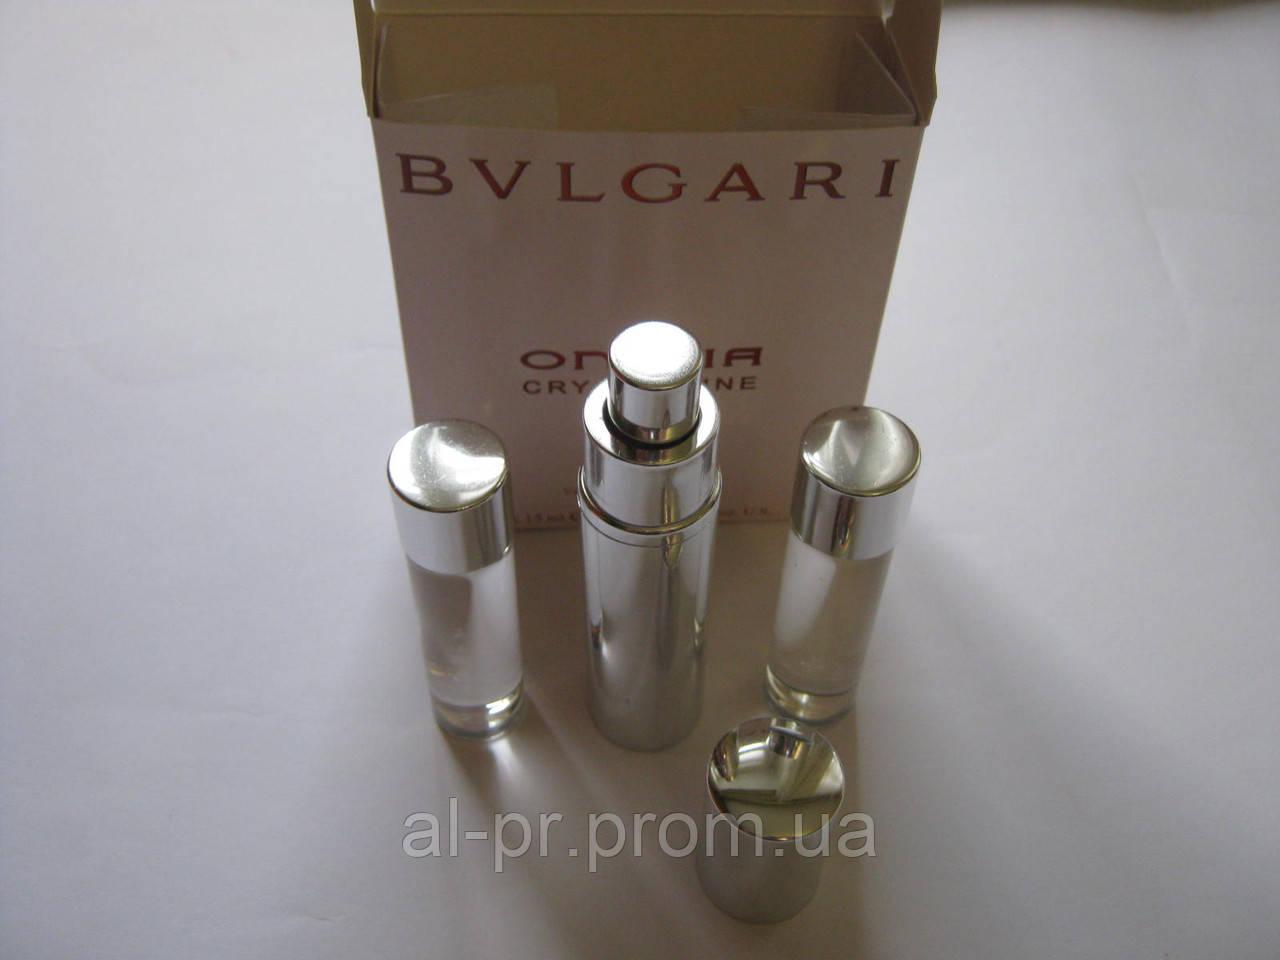 Набор парфюмерии Bvlgari Omnia Crystalline